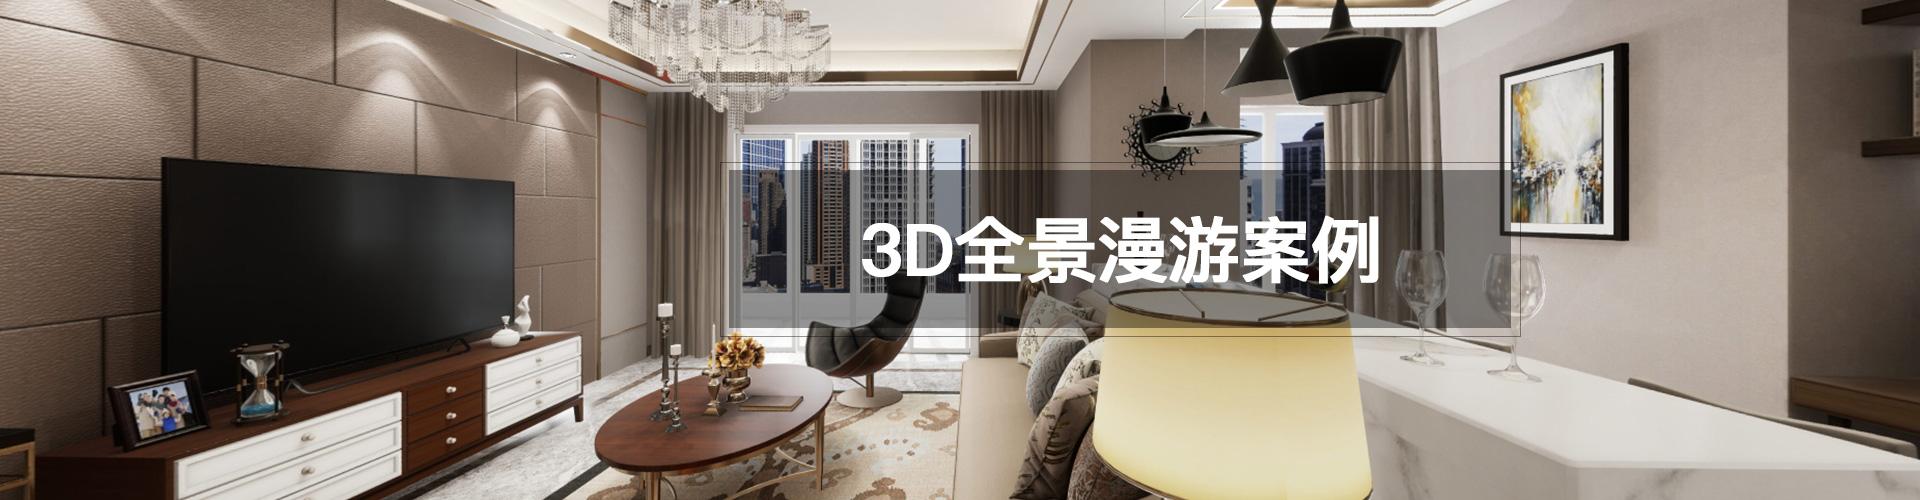 3D全景漫游案例